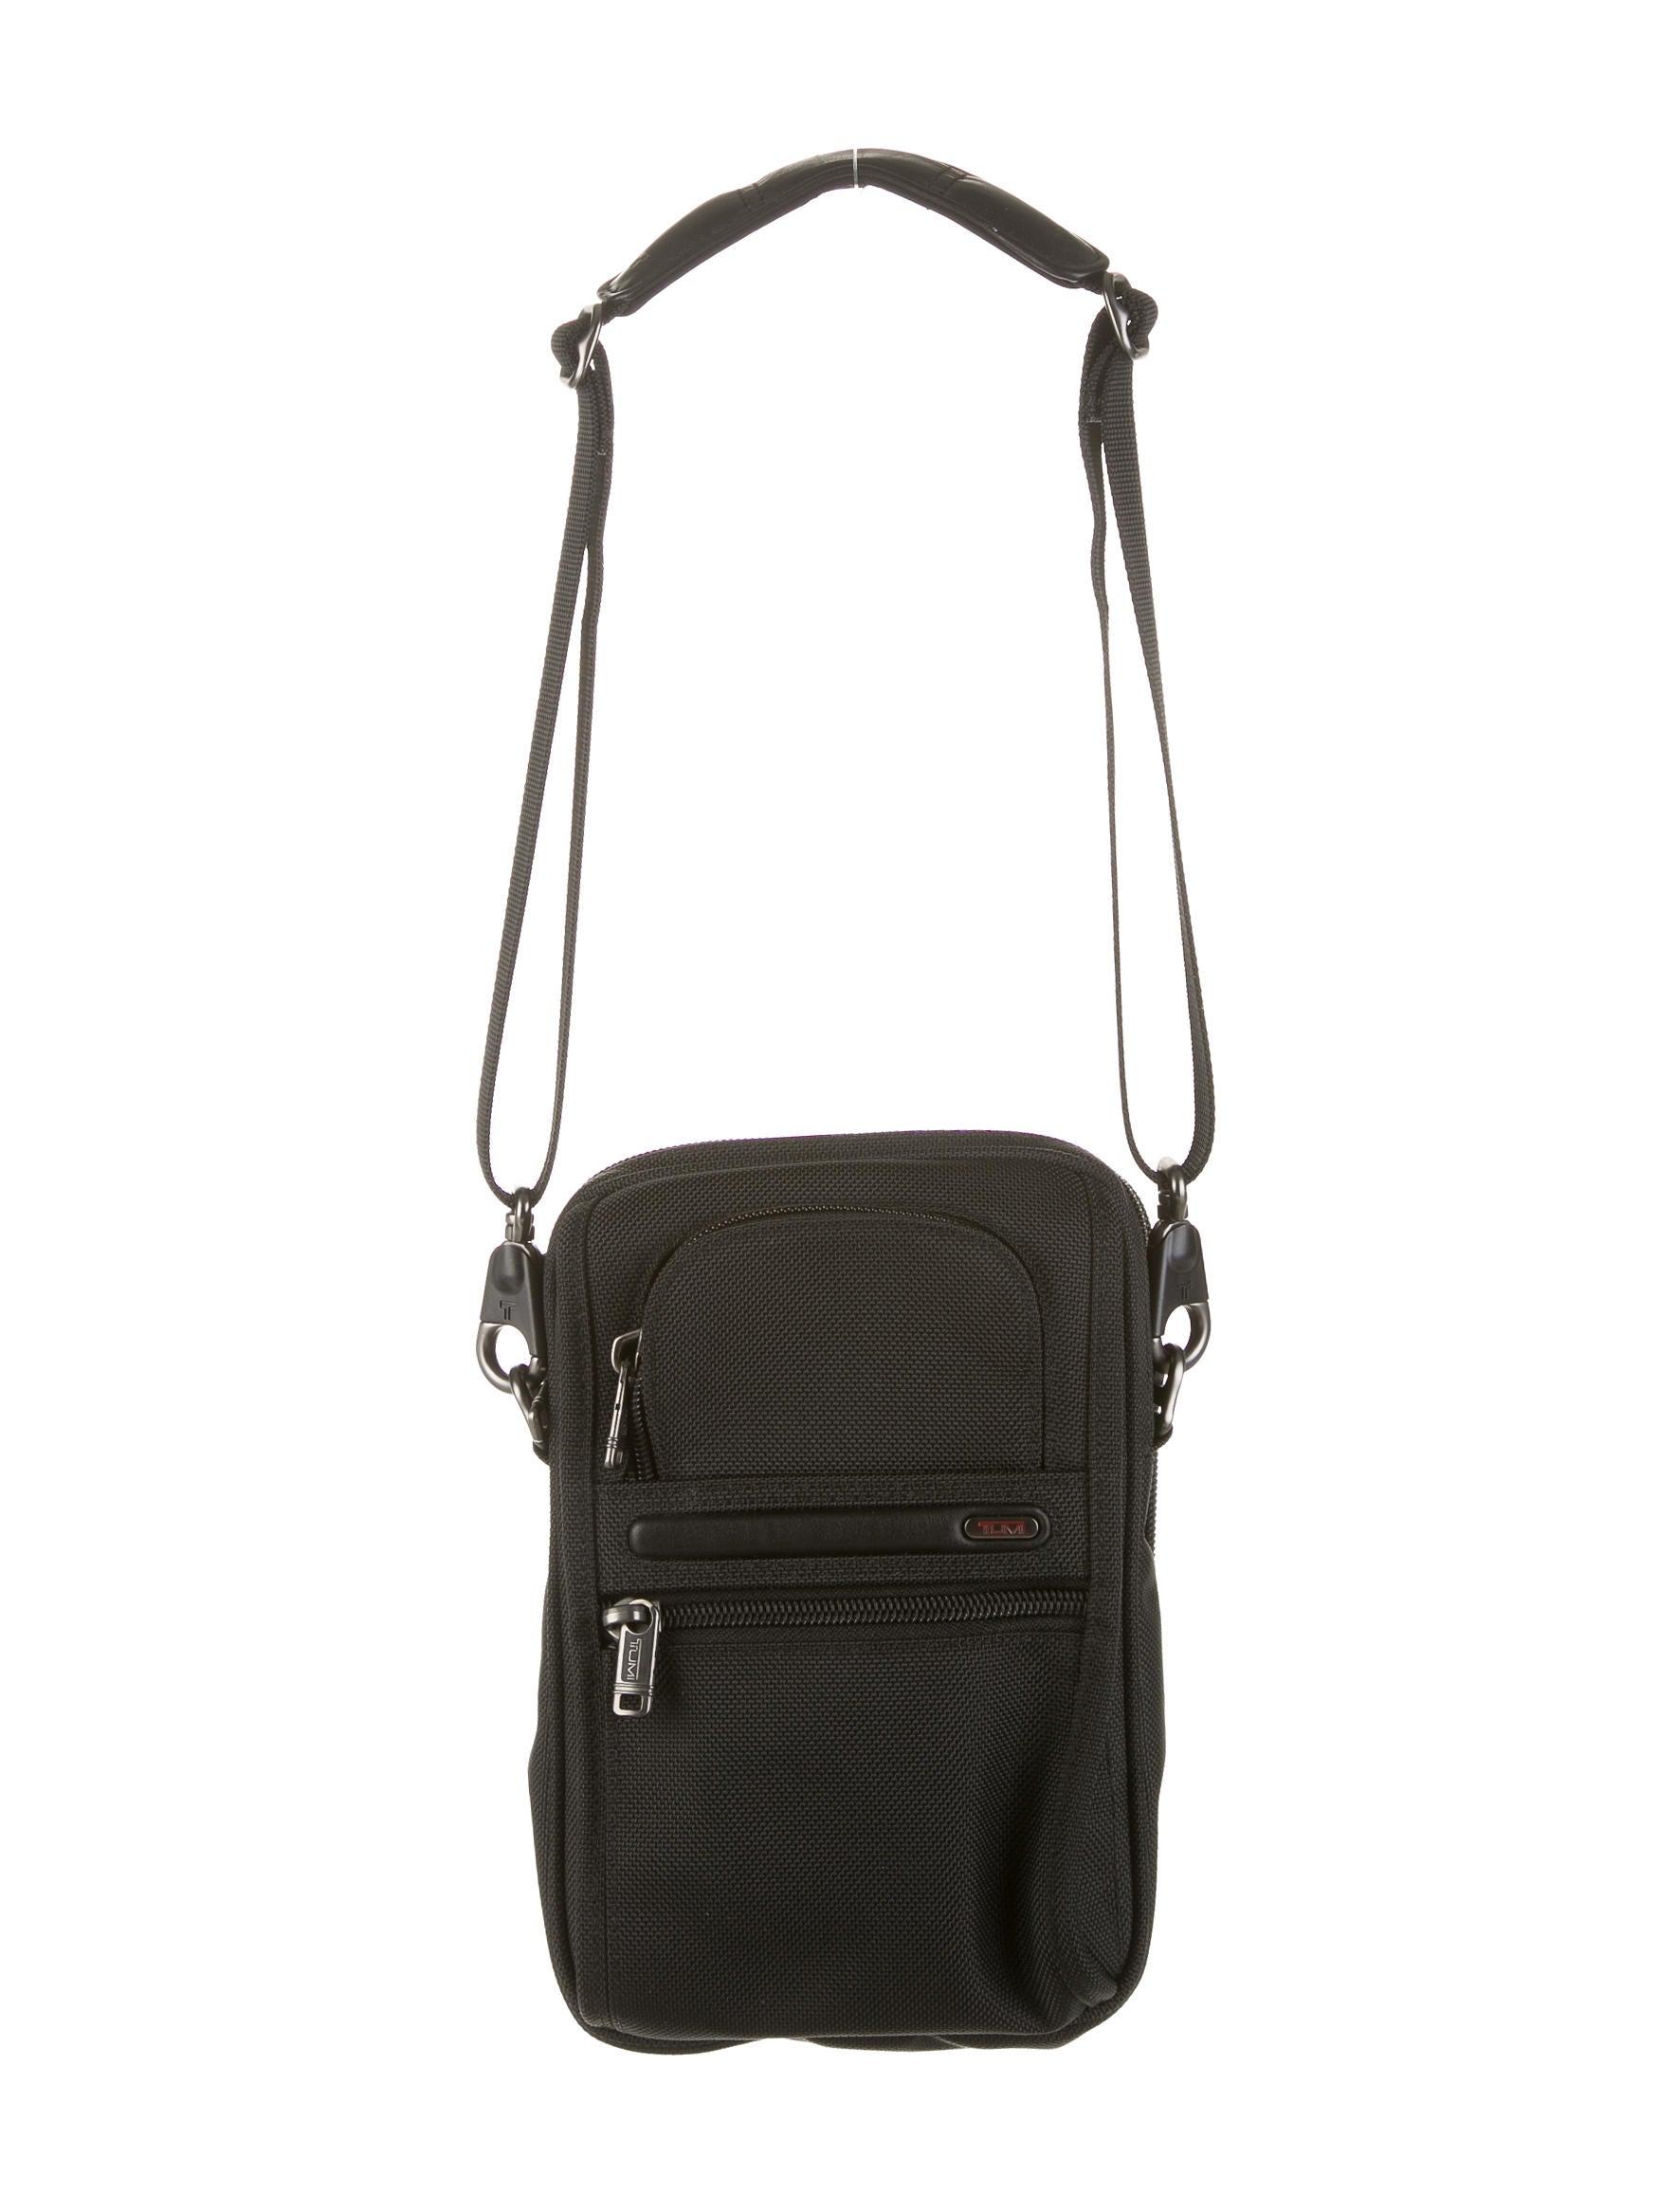 Contemporary Flatware Tumi Messenger Bag Bags Tmi20251 The Realreal